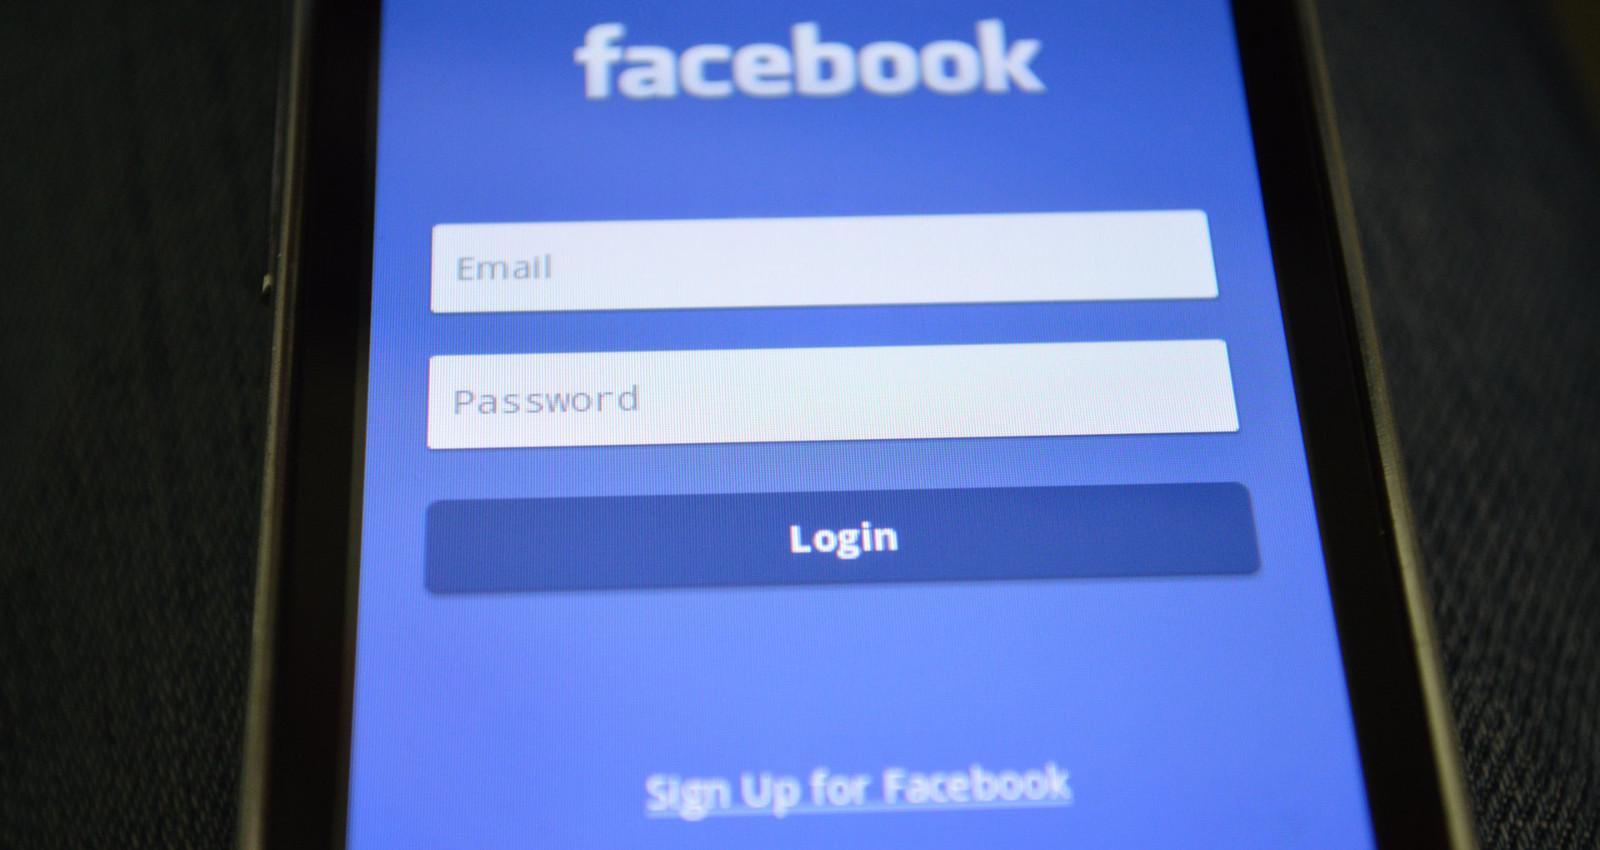 Facebook Marketing Tools